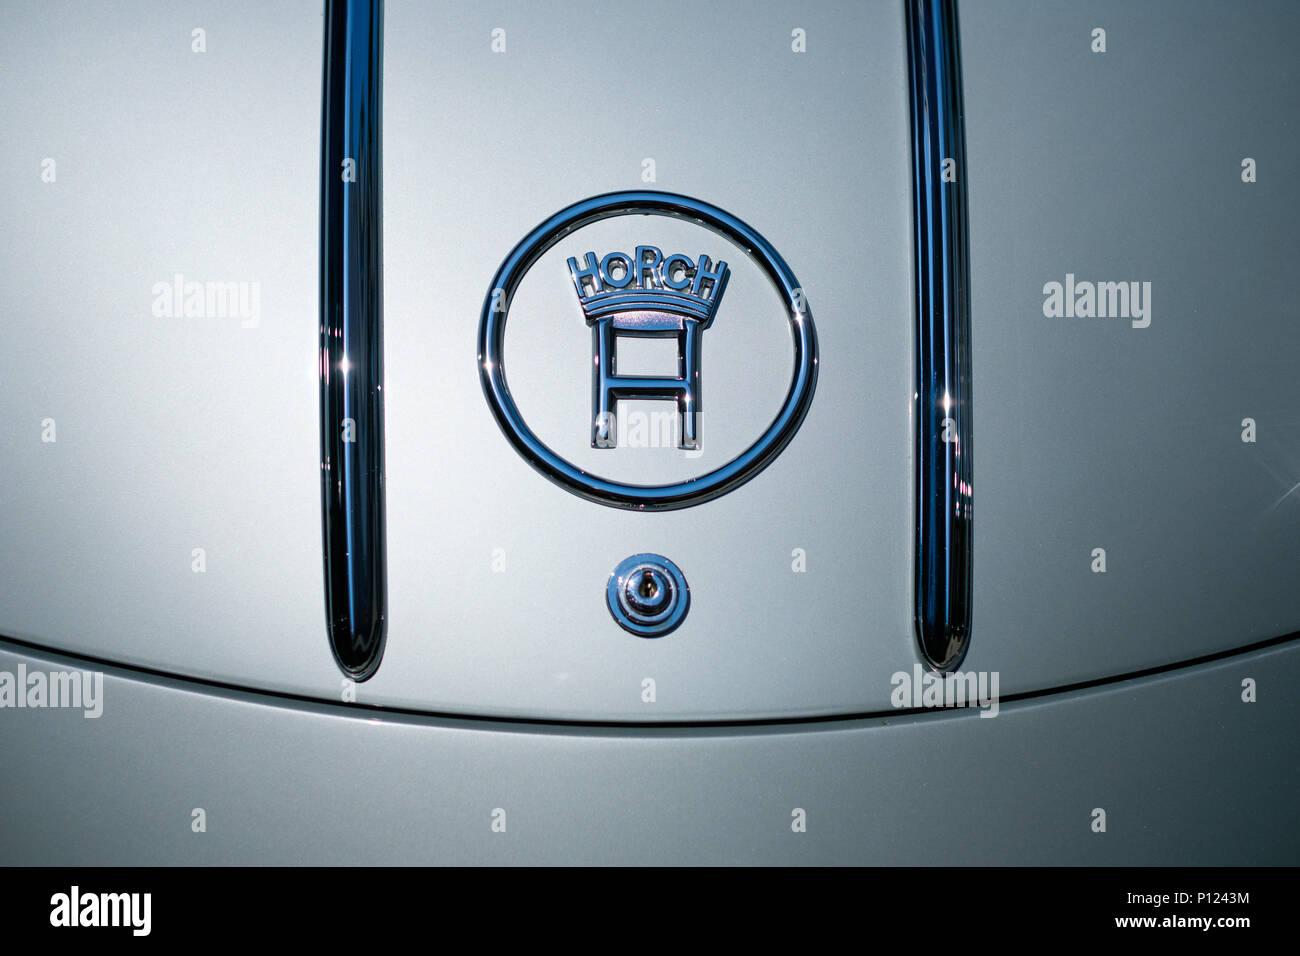 Berlin, Germany - june 09, 2018: Horch logo / brand name on oldtimer car trunk closeup - Stock Image